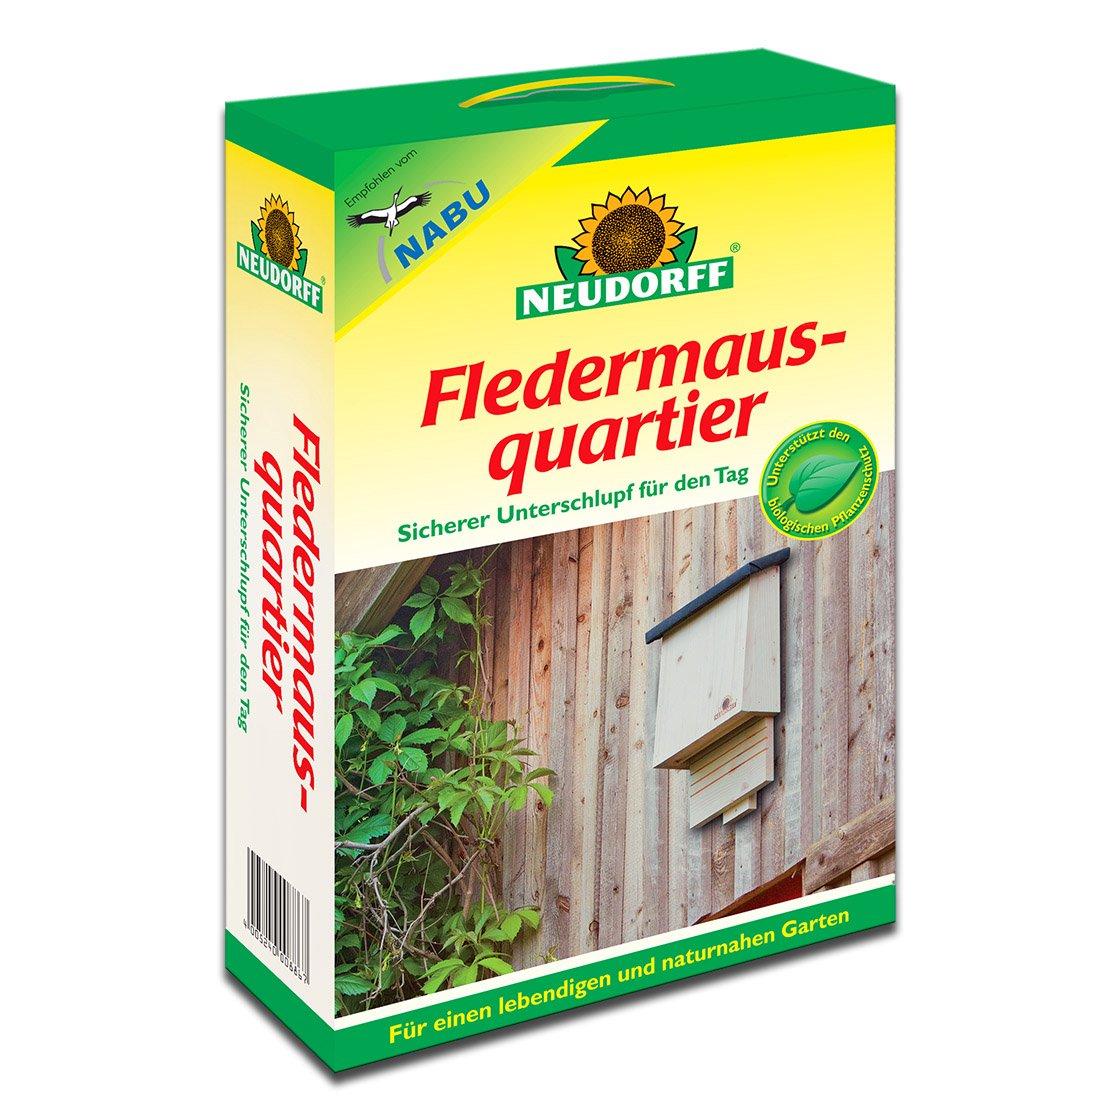 Neudorff Fledermausquartier Fledermaushaus